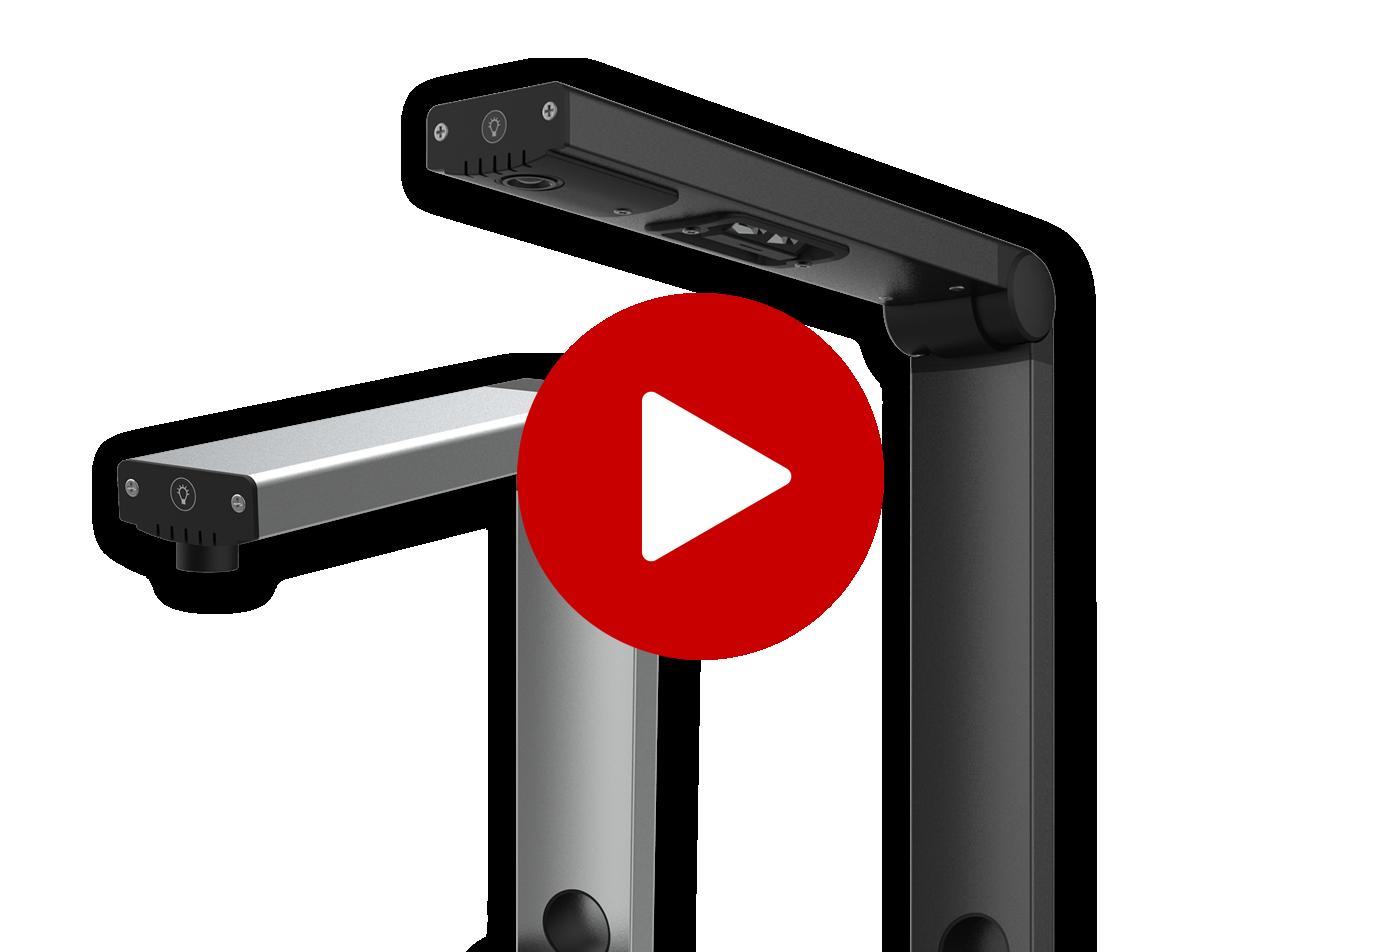 IRIScan Desk 5 Pro - Desktop camera scanner